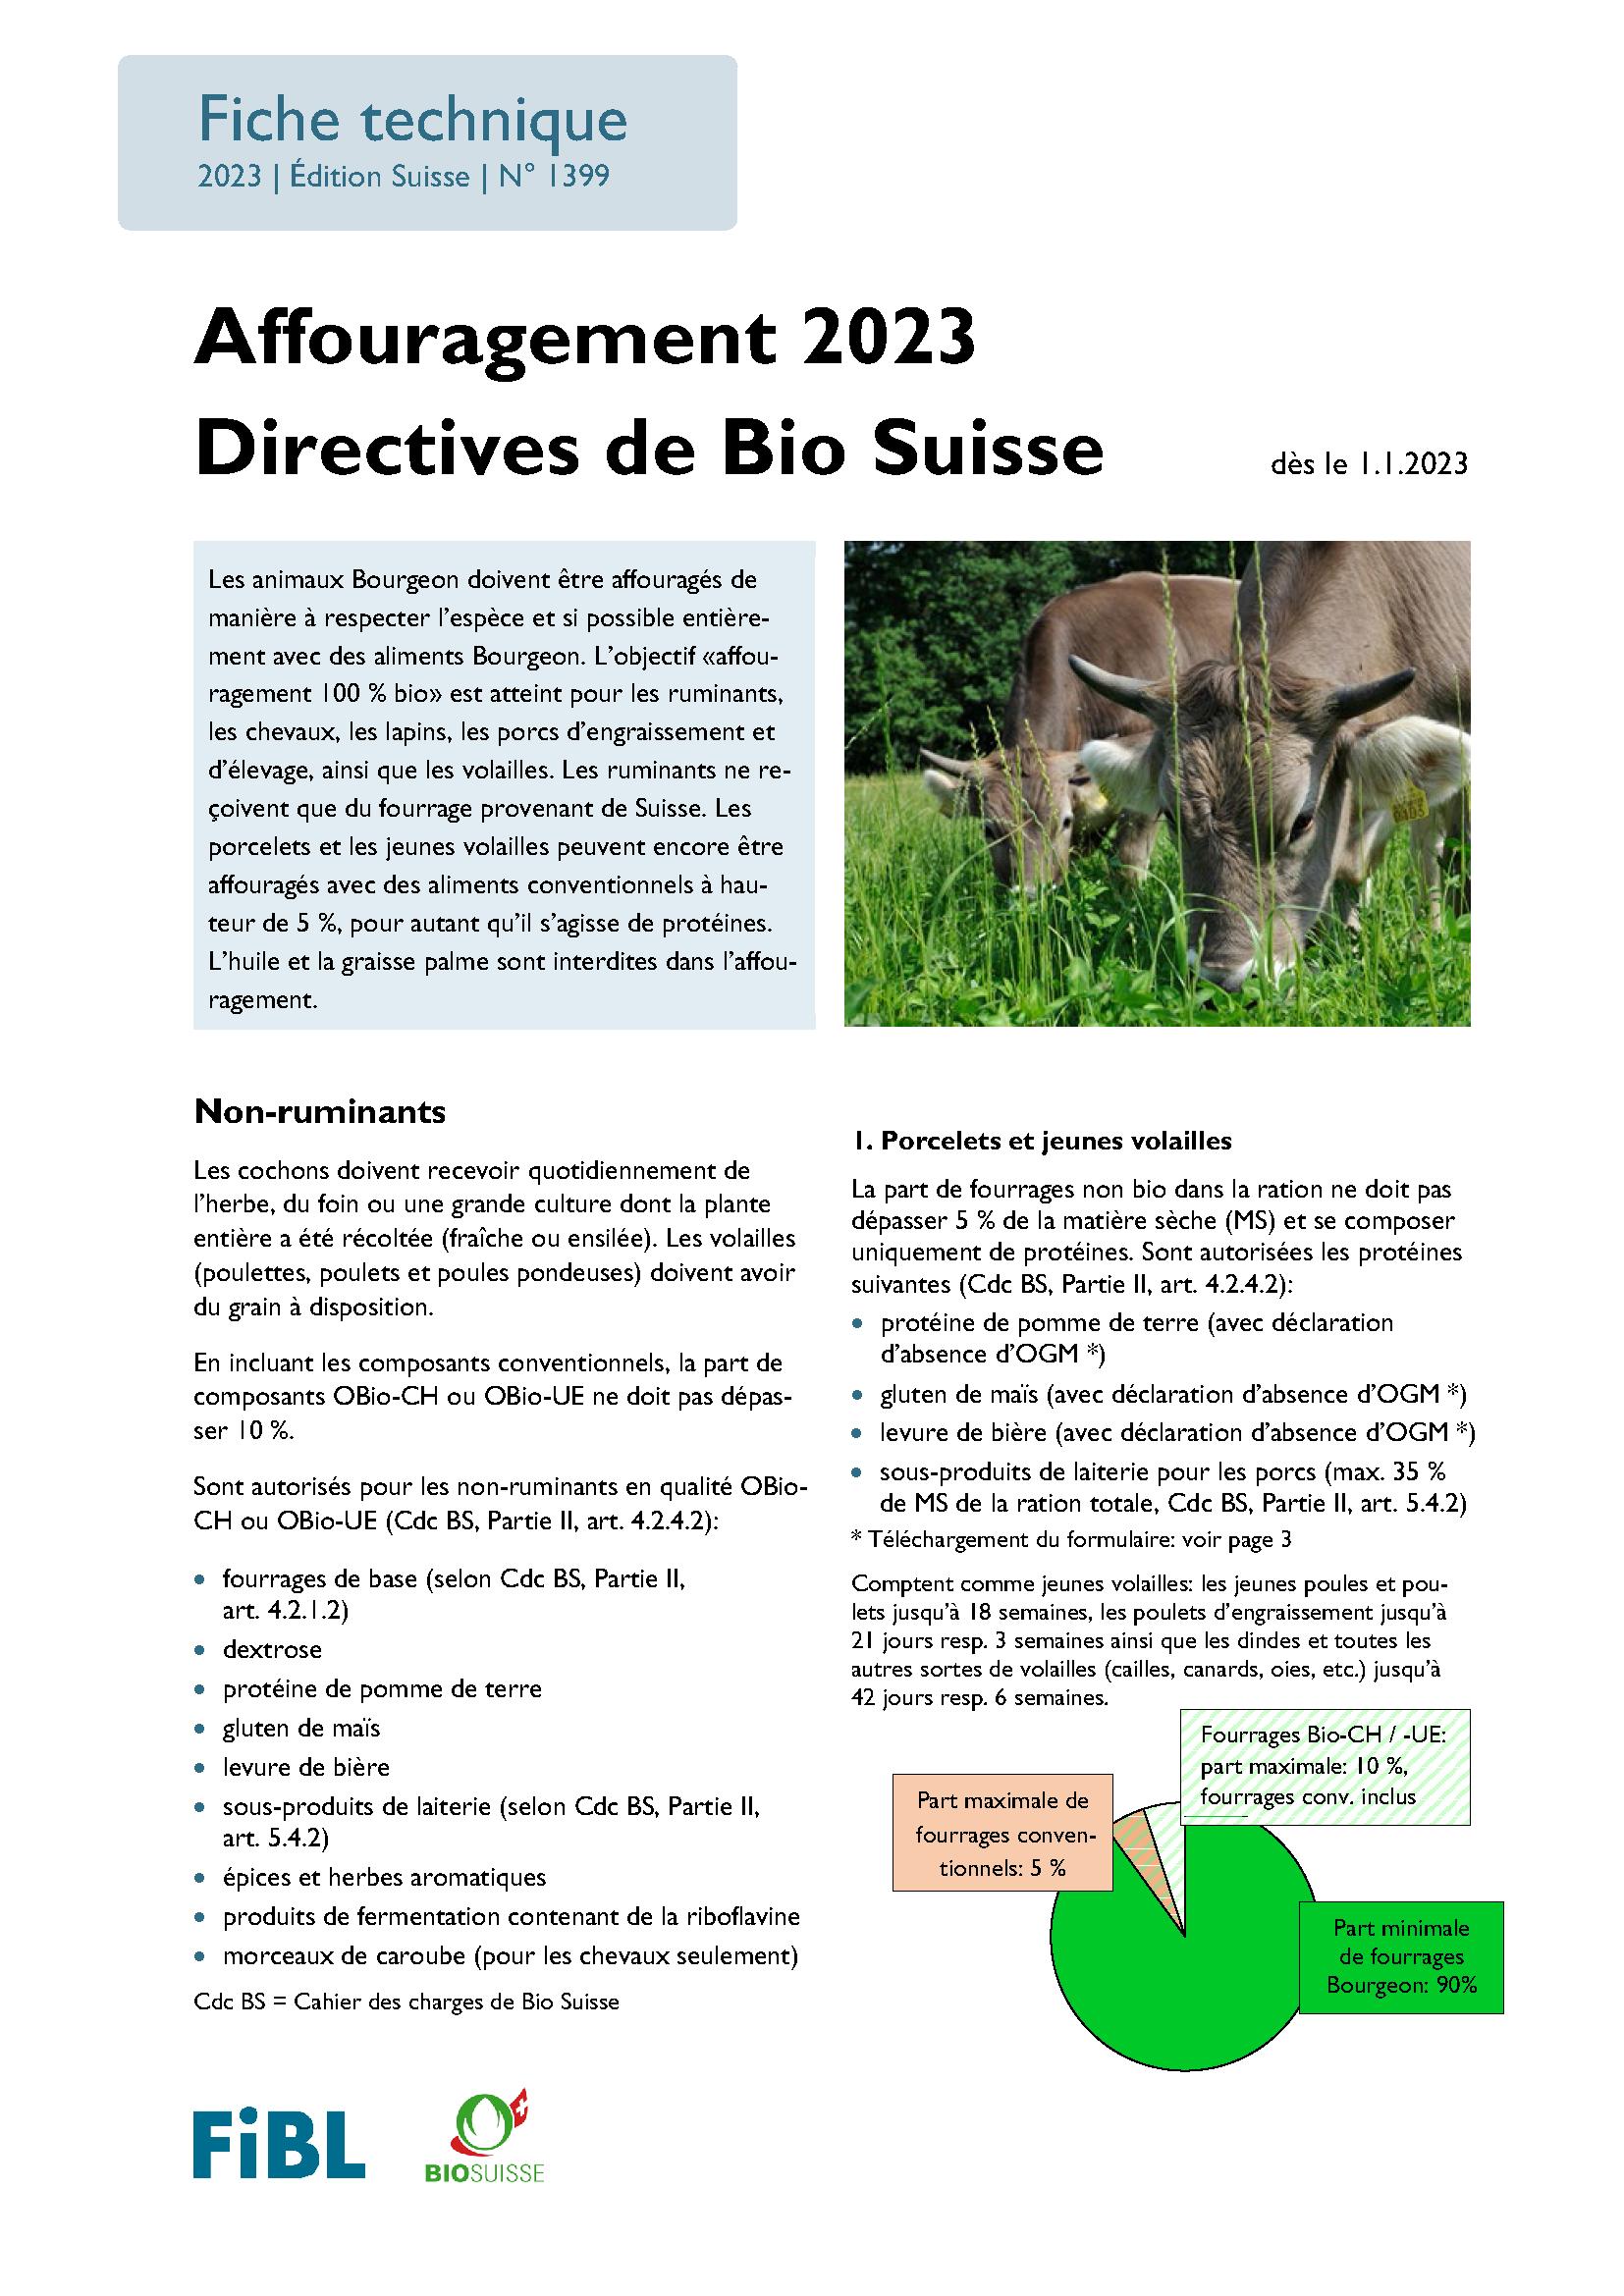 Affouragement 2021 Directives de Bio Suisse